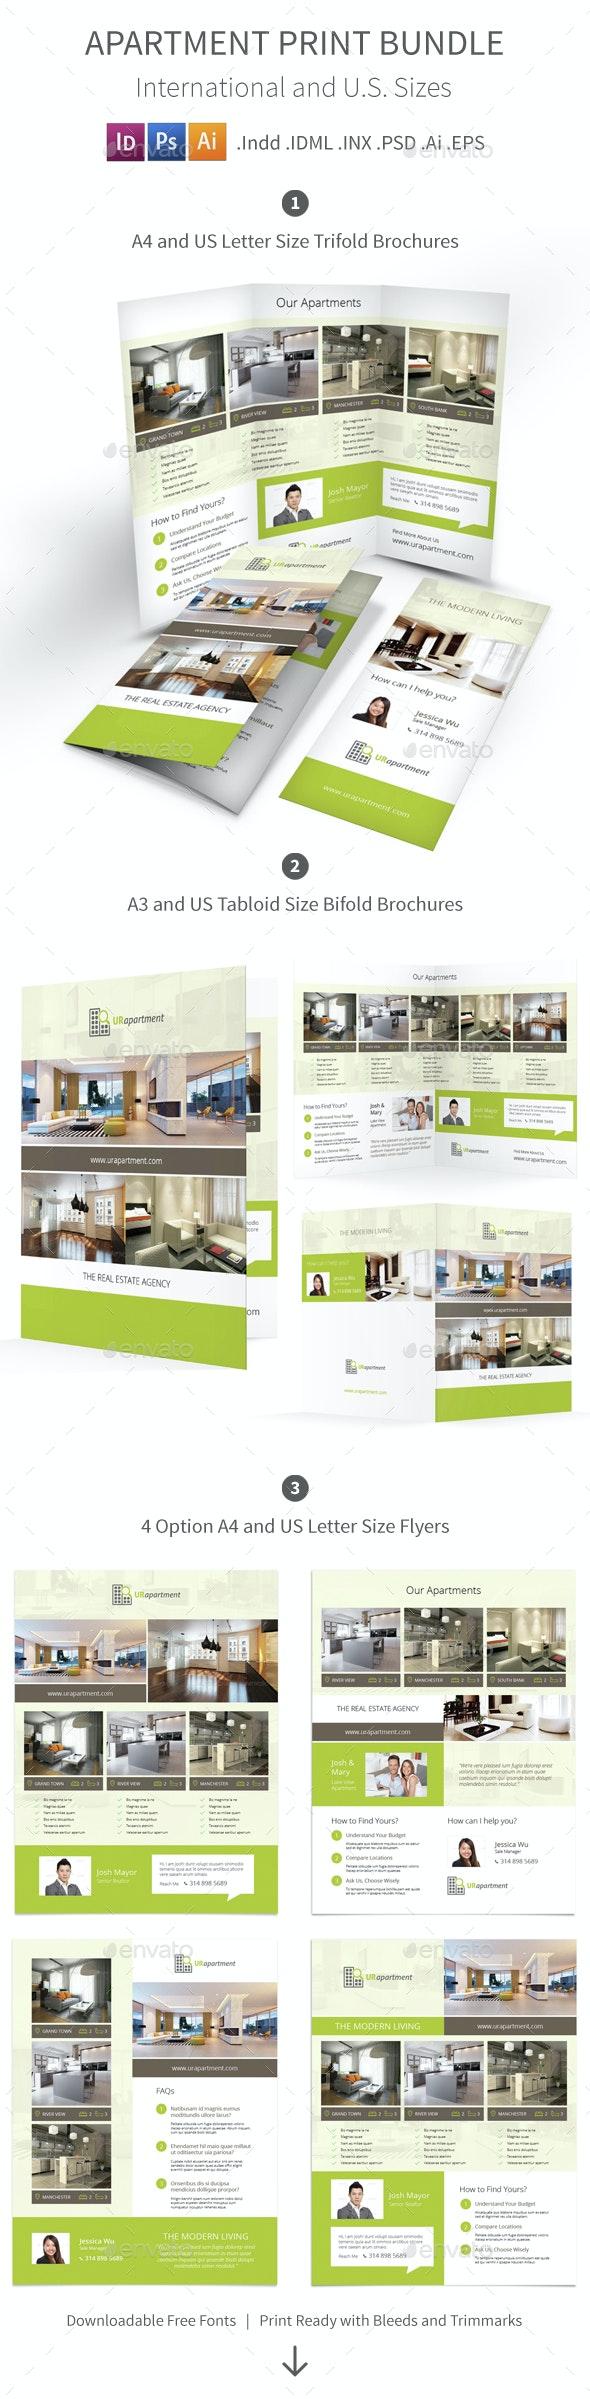 Apartment For Rent Print Bundle - Informational Brochures